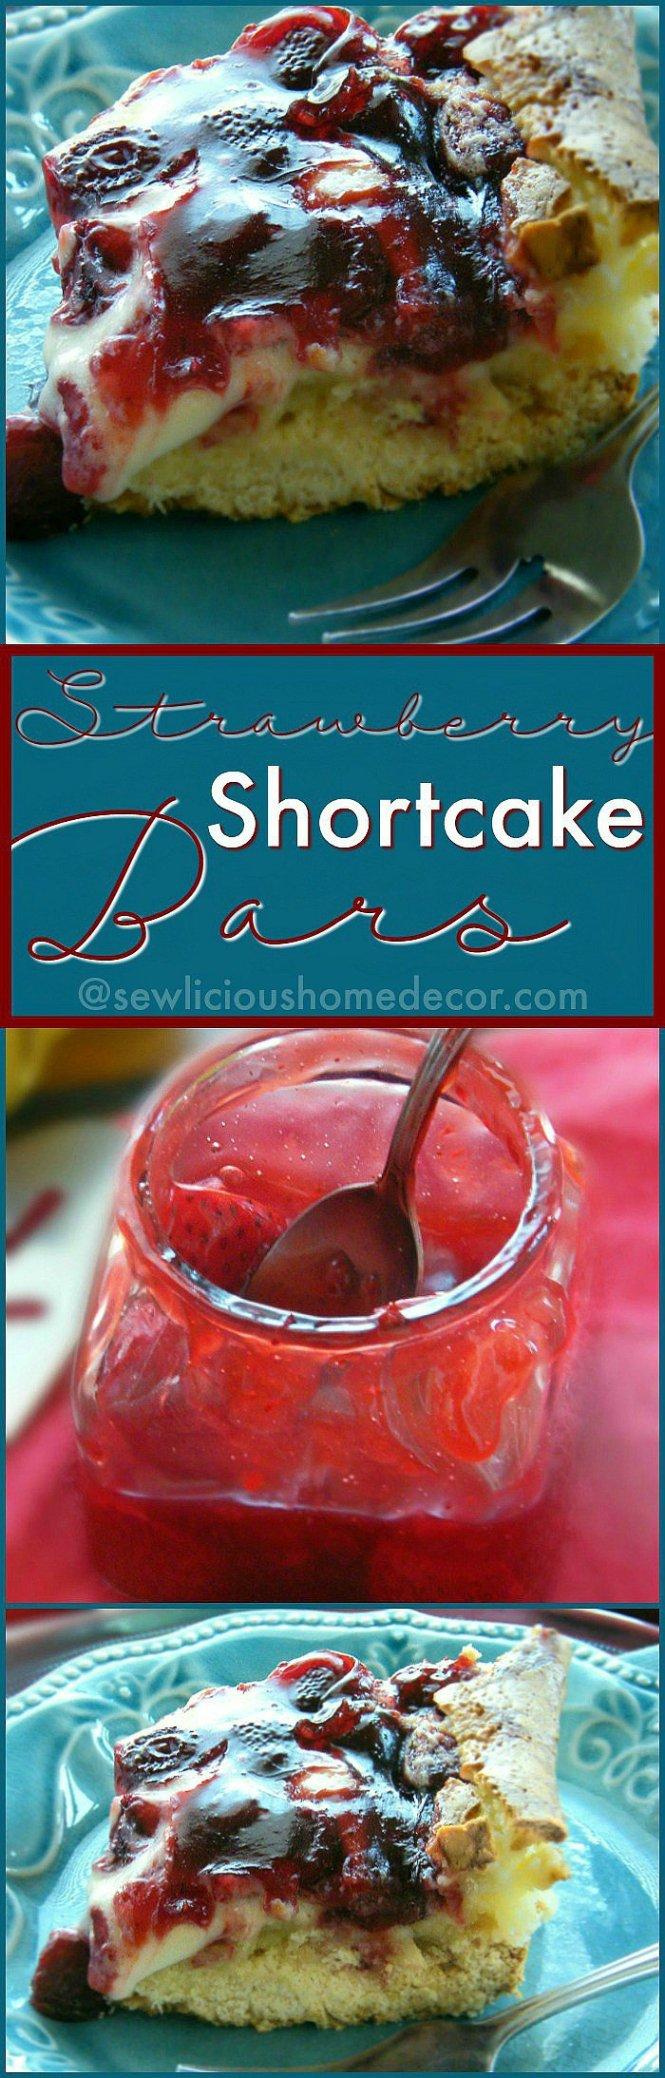 Strawberry Cheesecake Shortcake Bars. sewlicioushomedecor.com